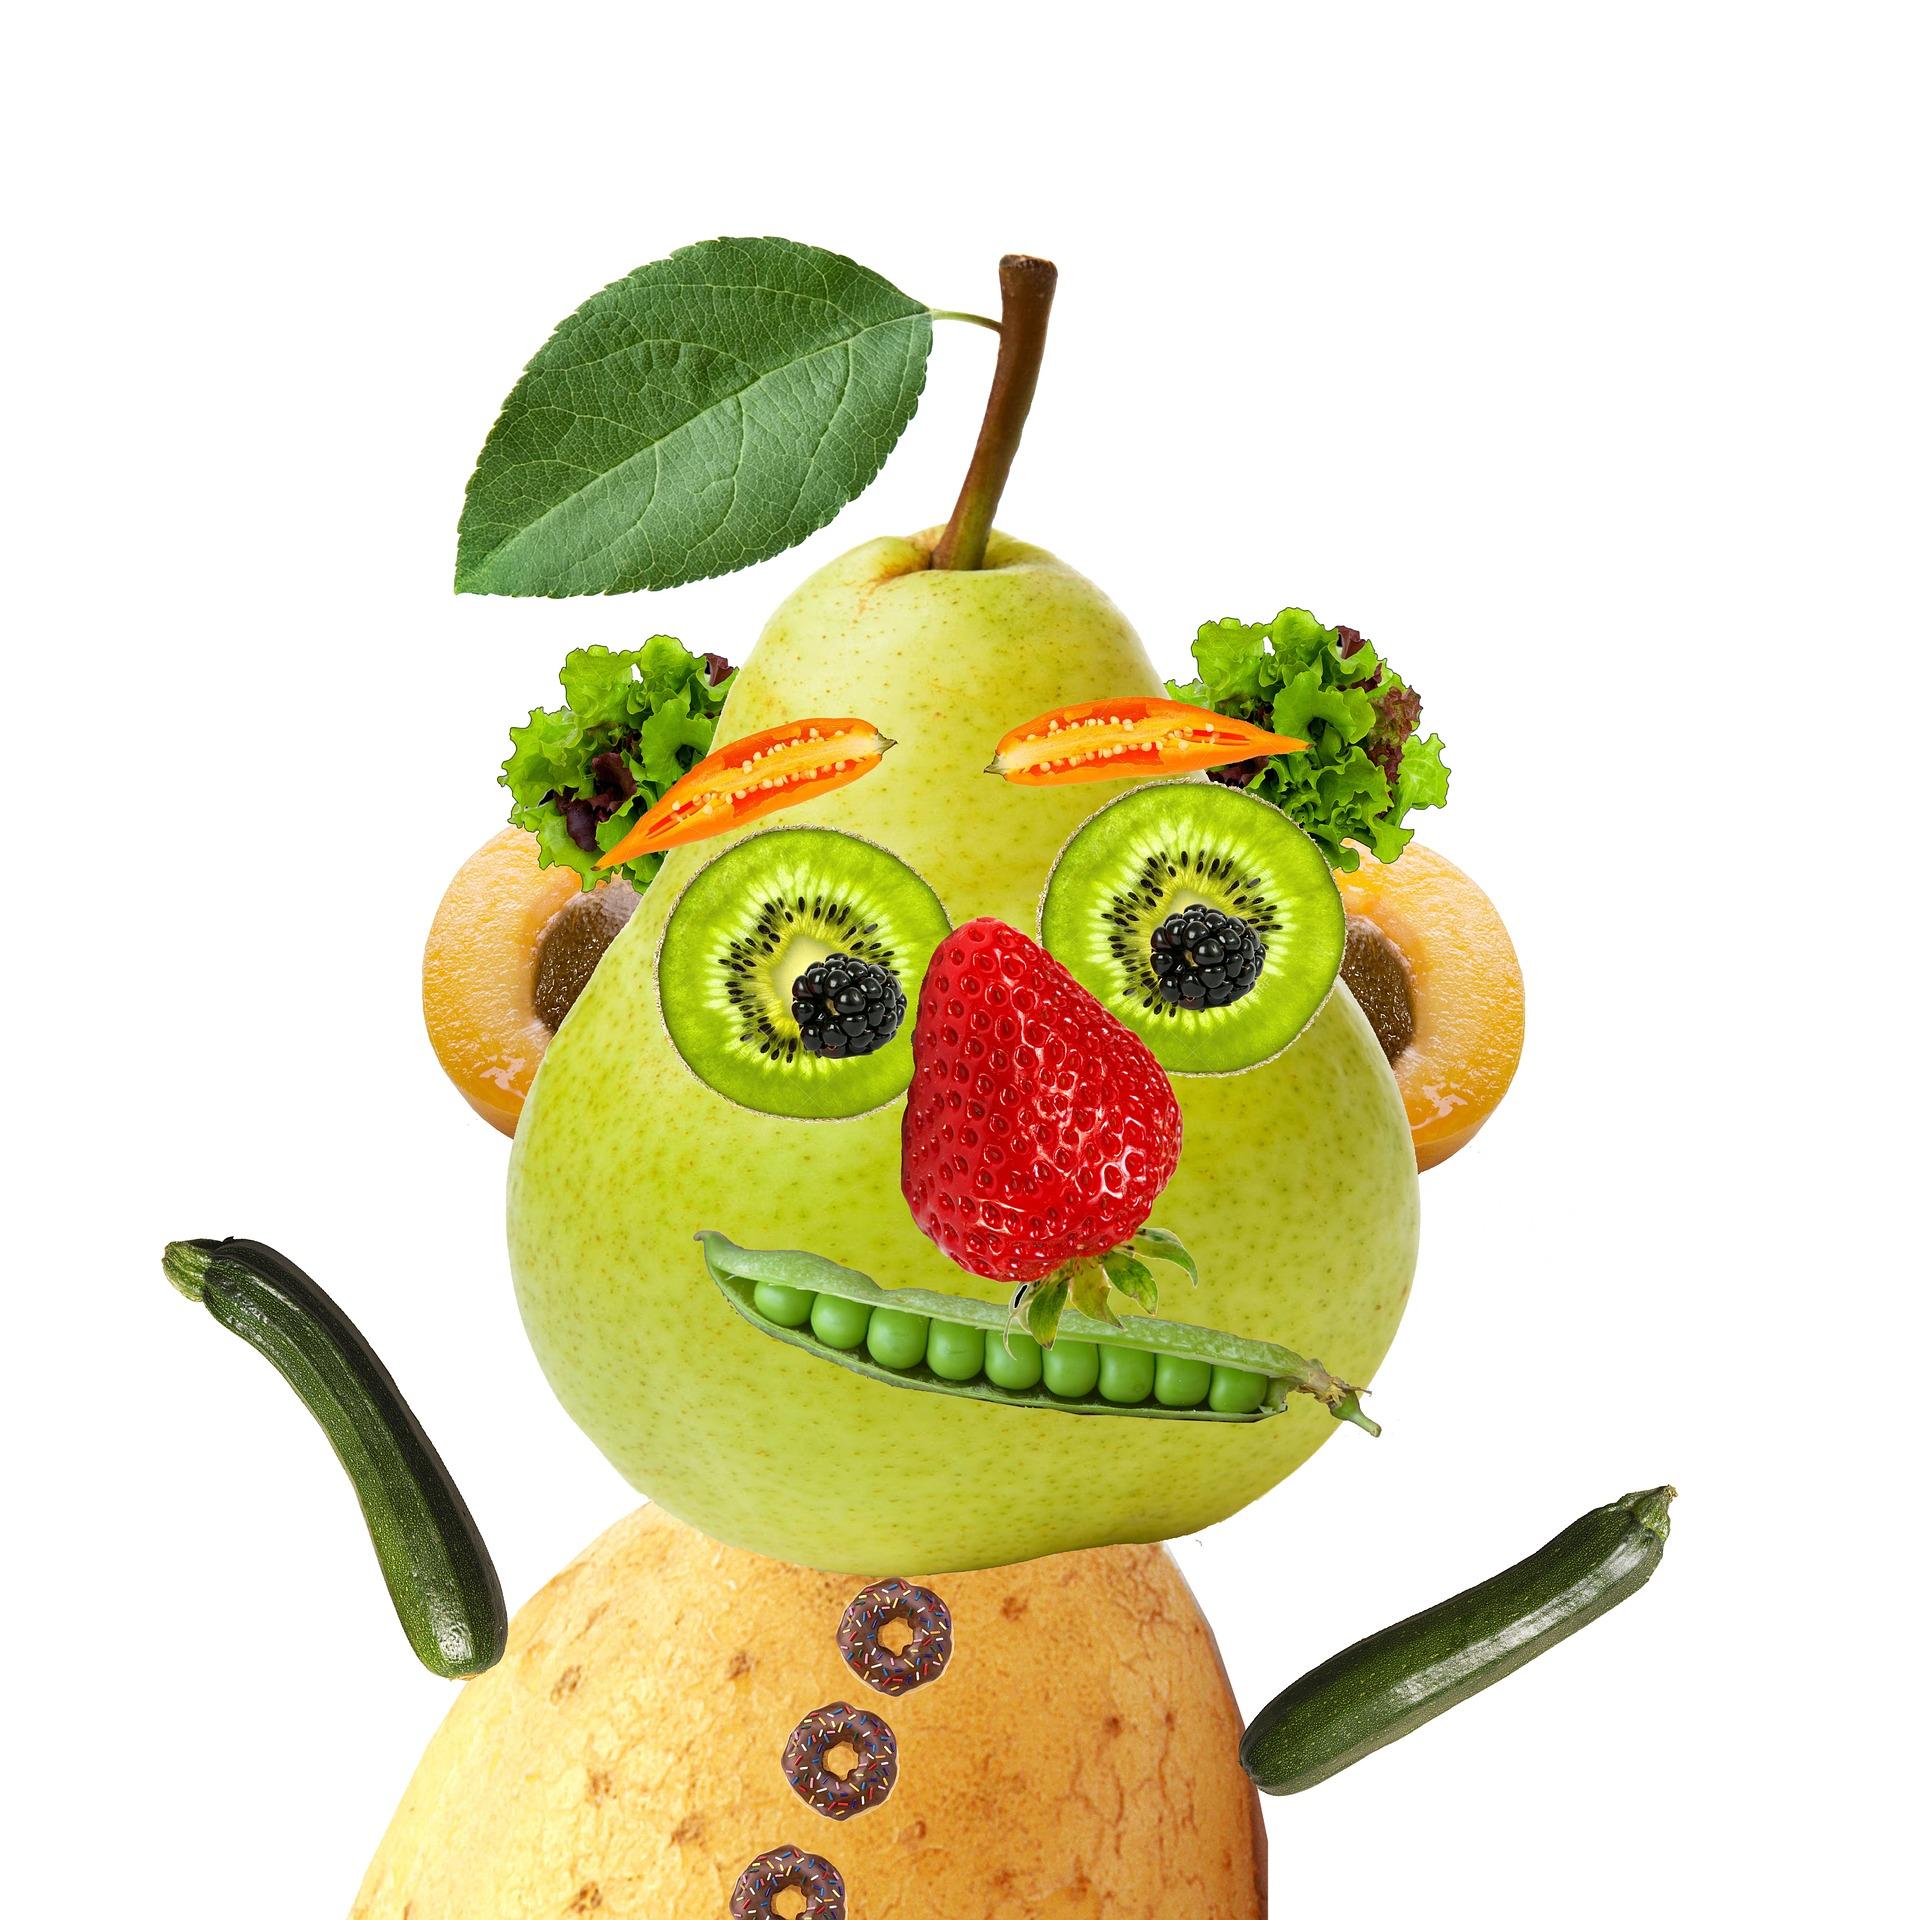 pear-1768619_1920